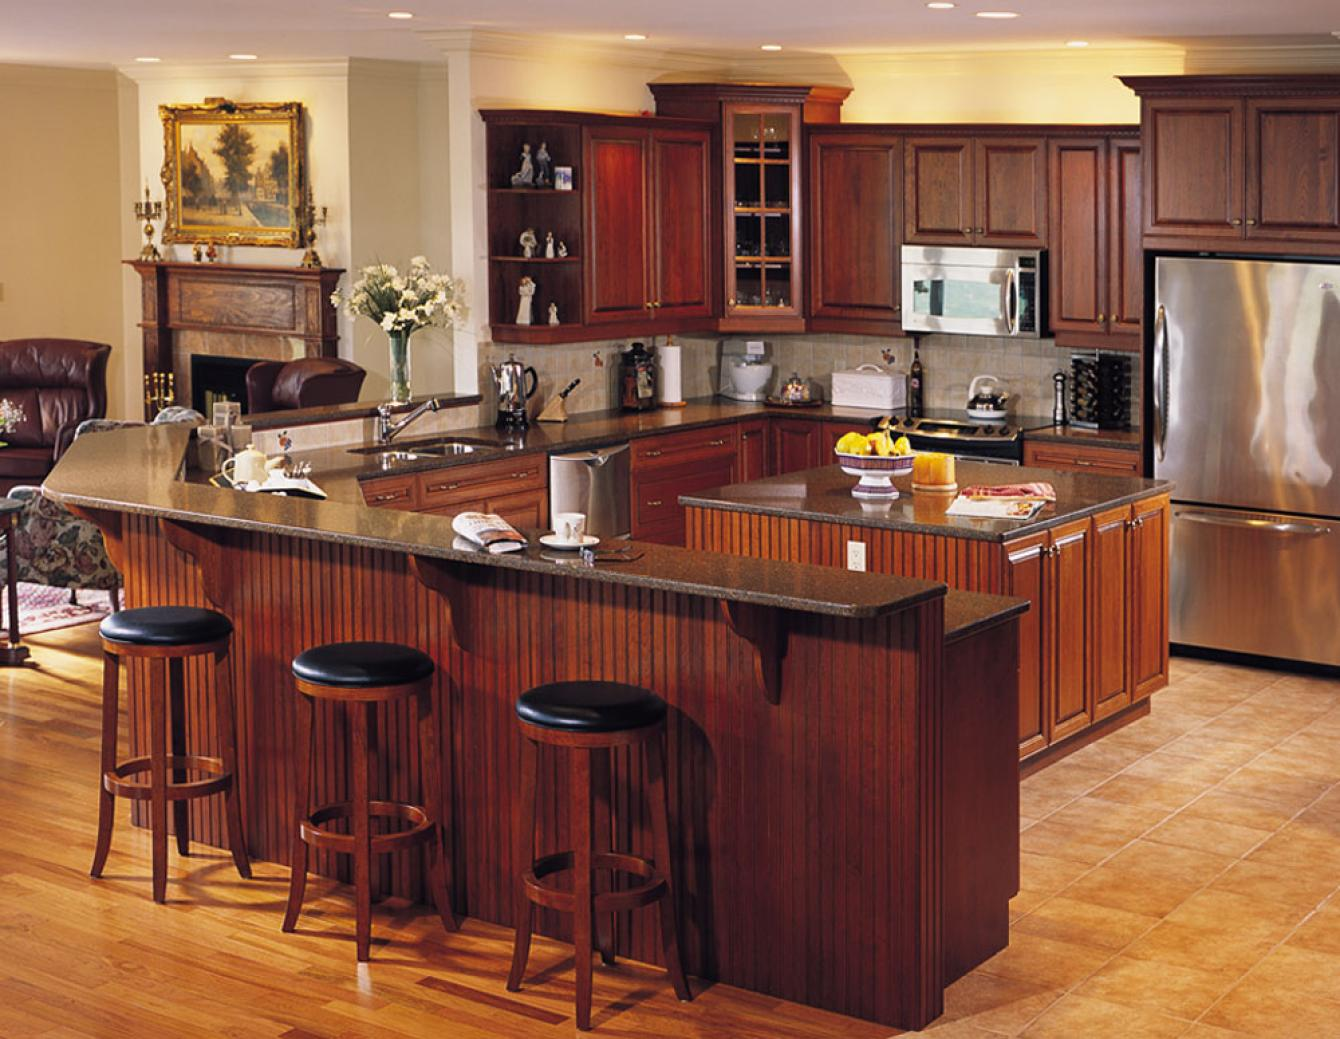 High Quality Kitchen Design Gallery